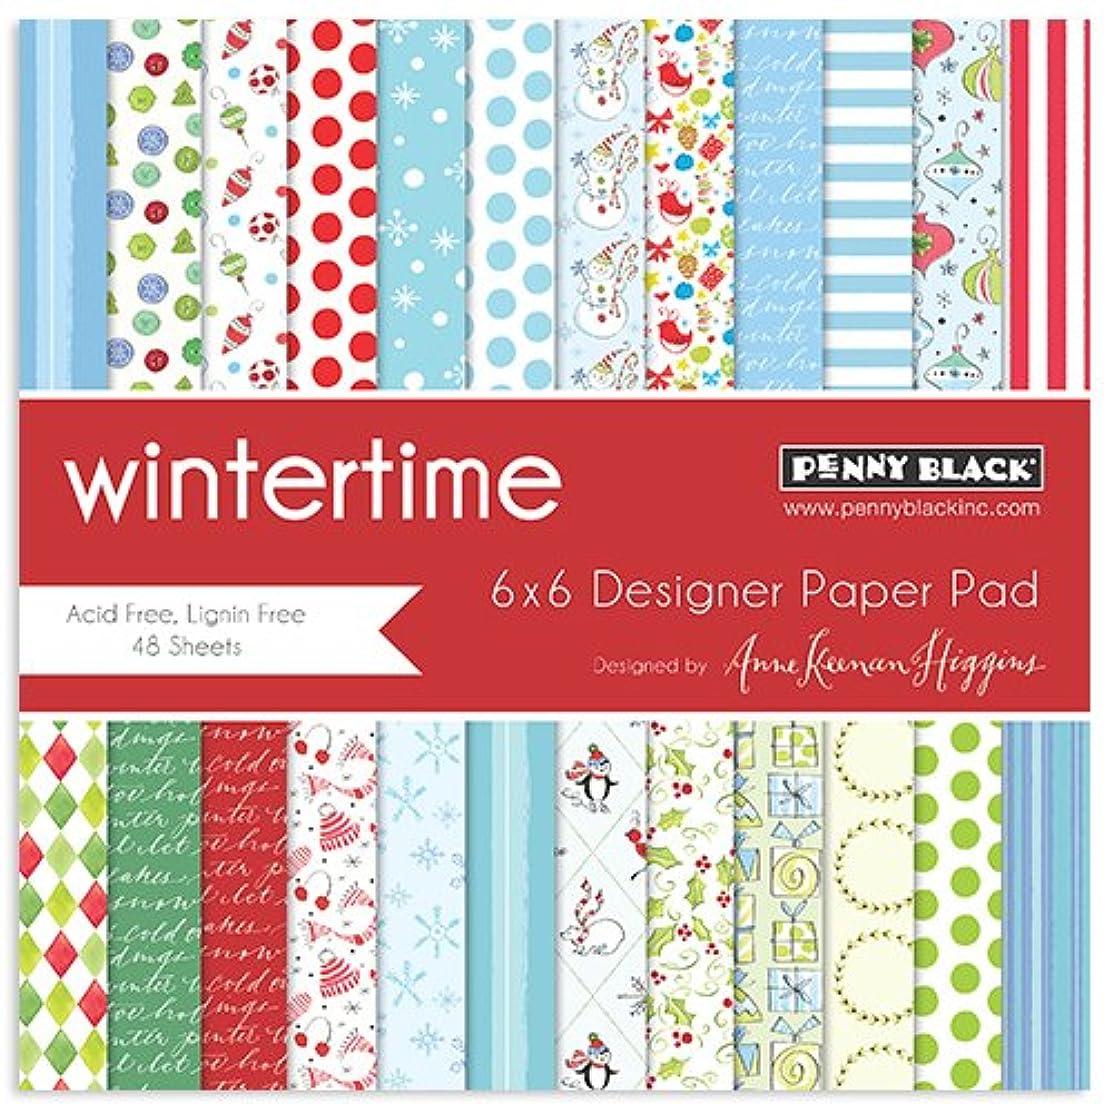 Penny Black 80-012 Wintertime Paper Pad, 6 x 6